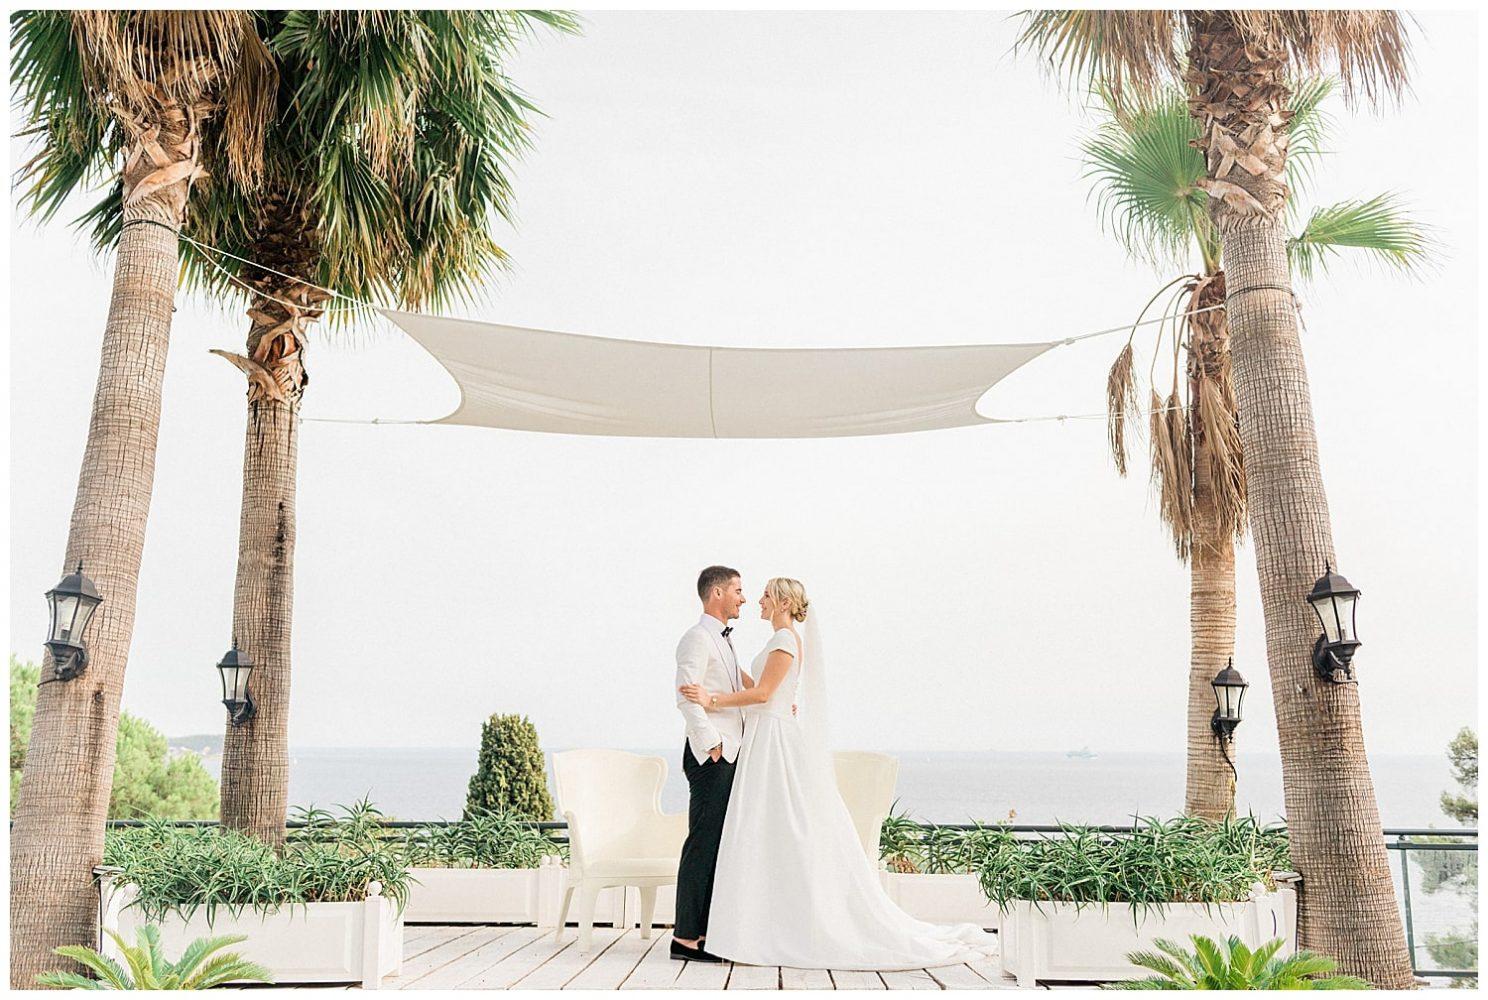 photographie mariage en provence